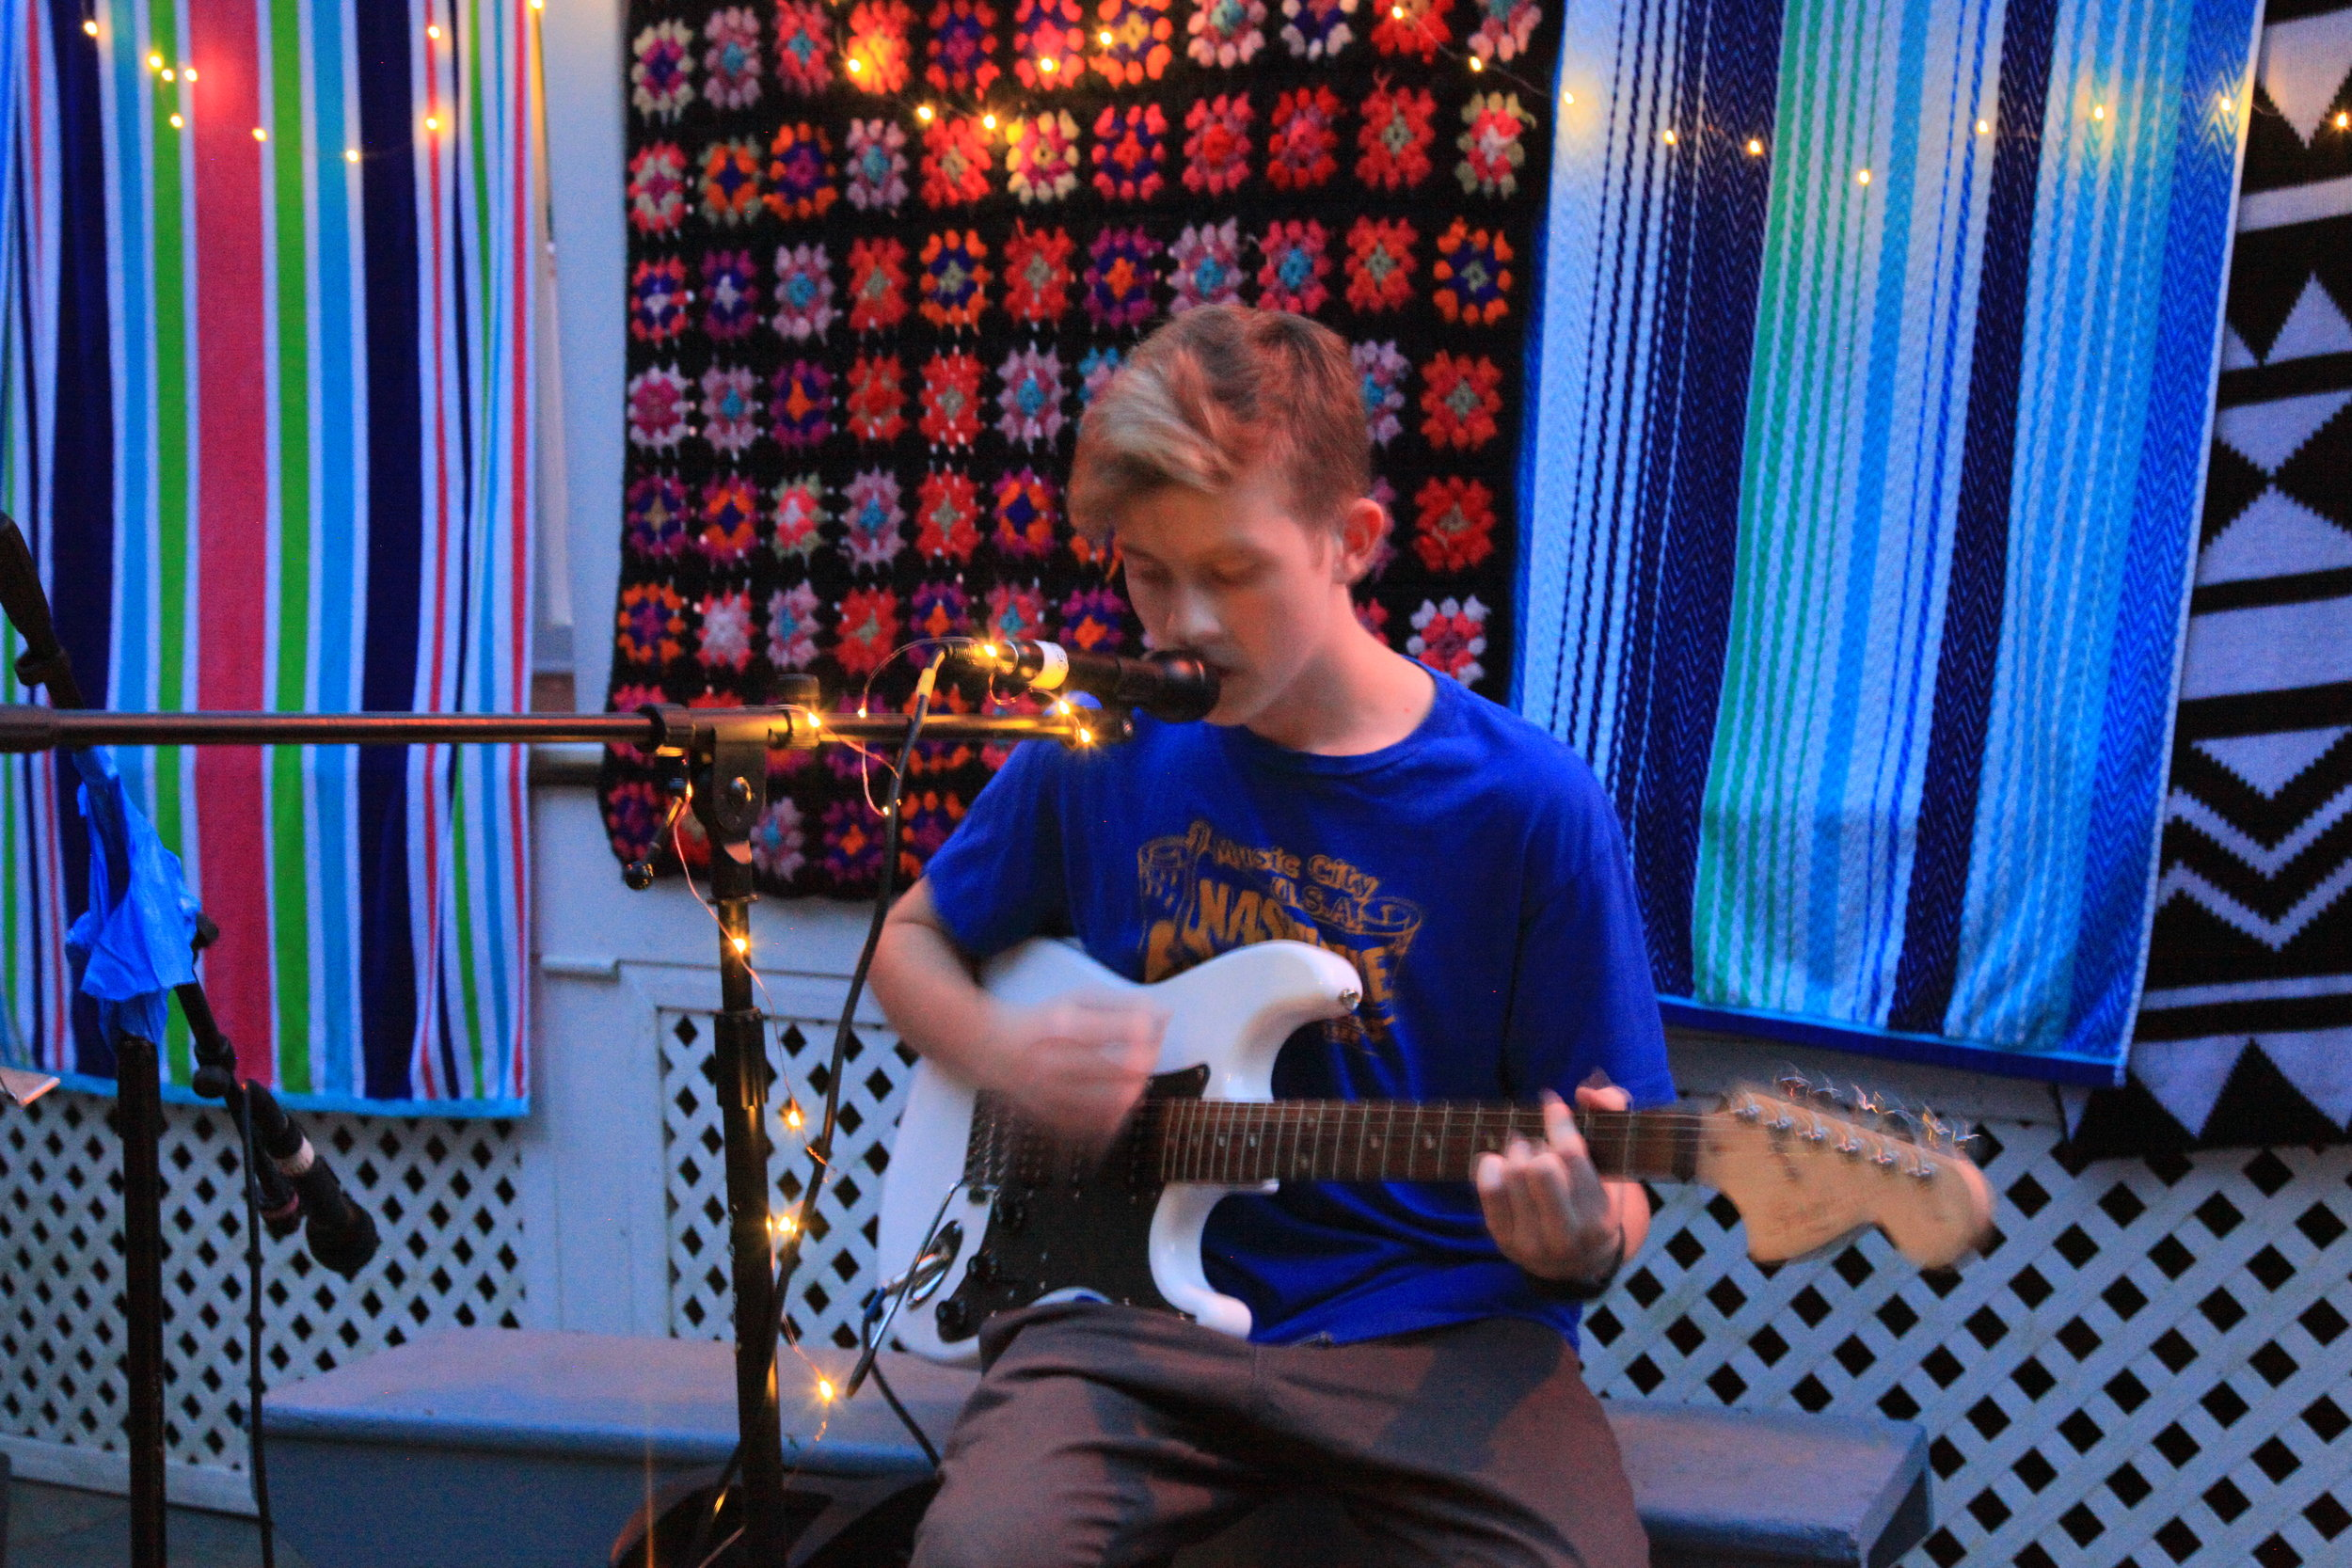 Ryan Boron on his guitar